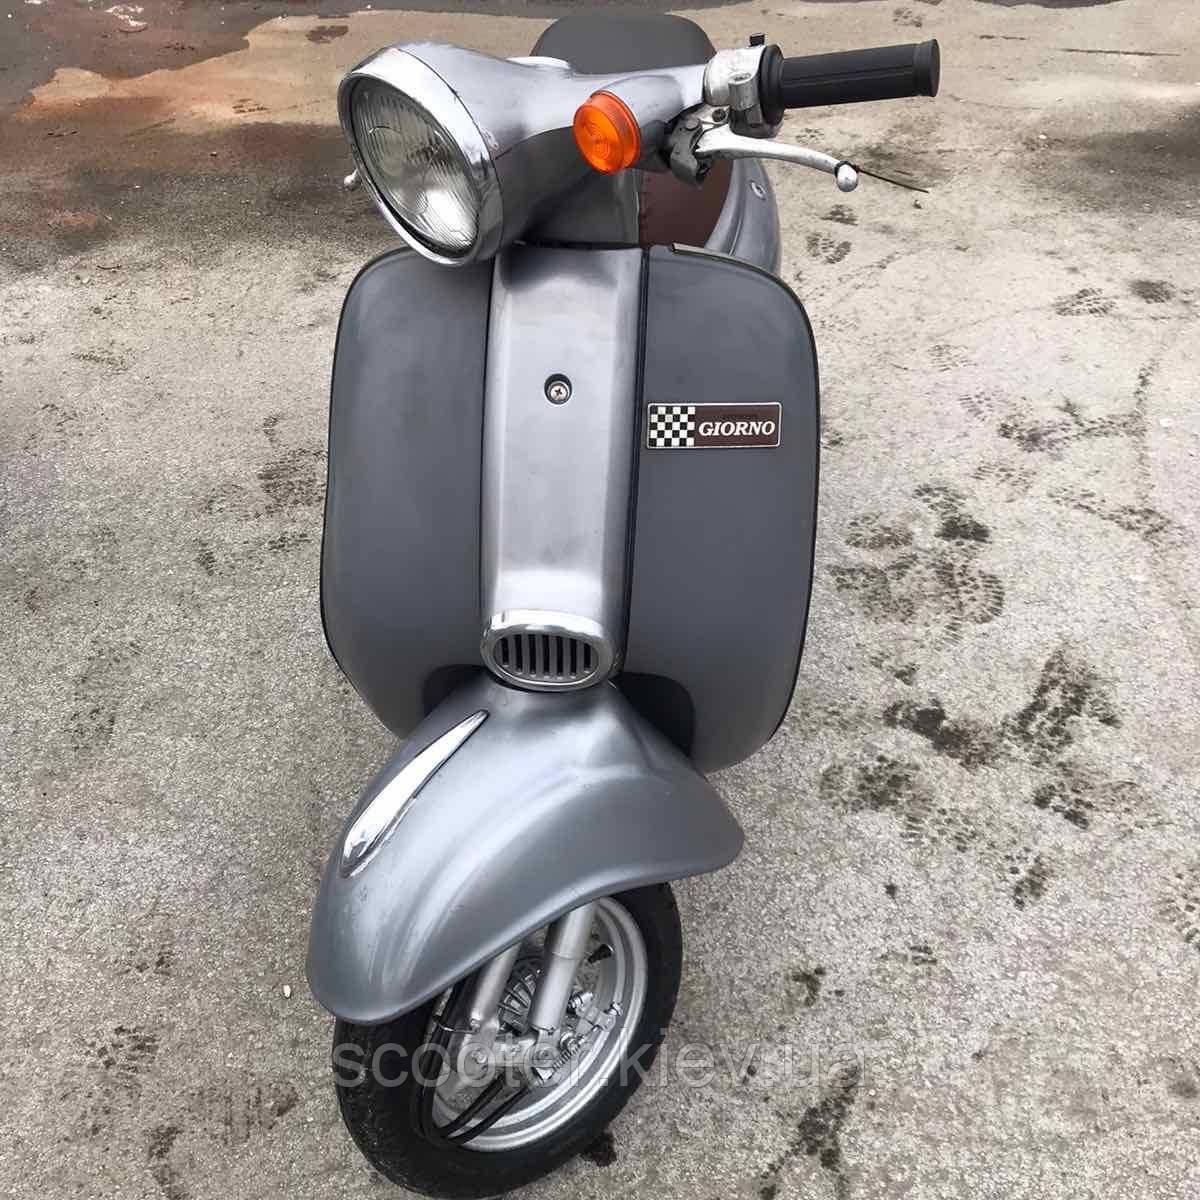 Мопед Honda Giorno DELUXE